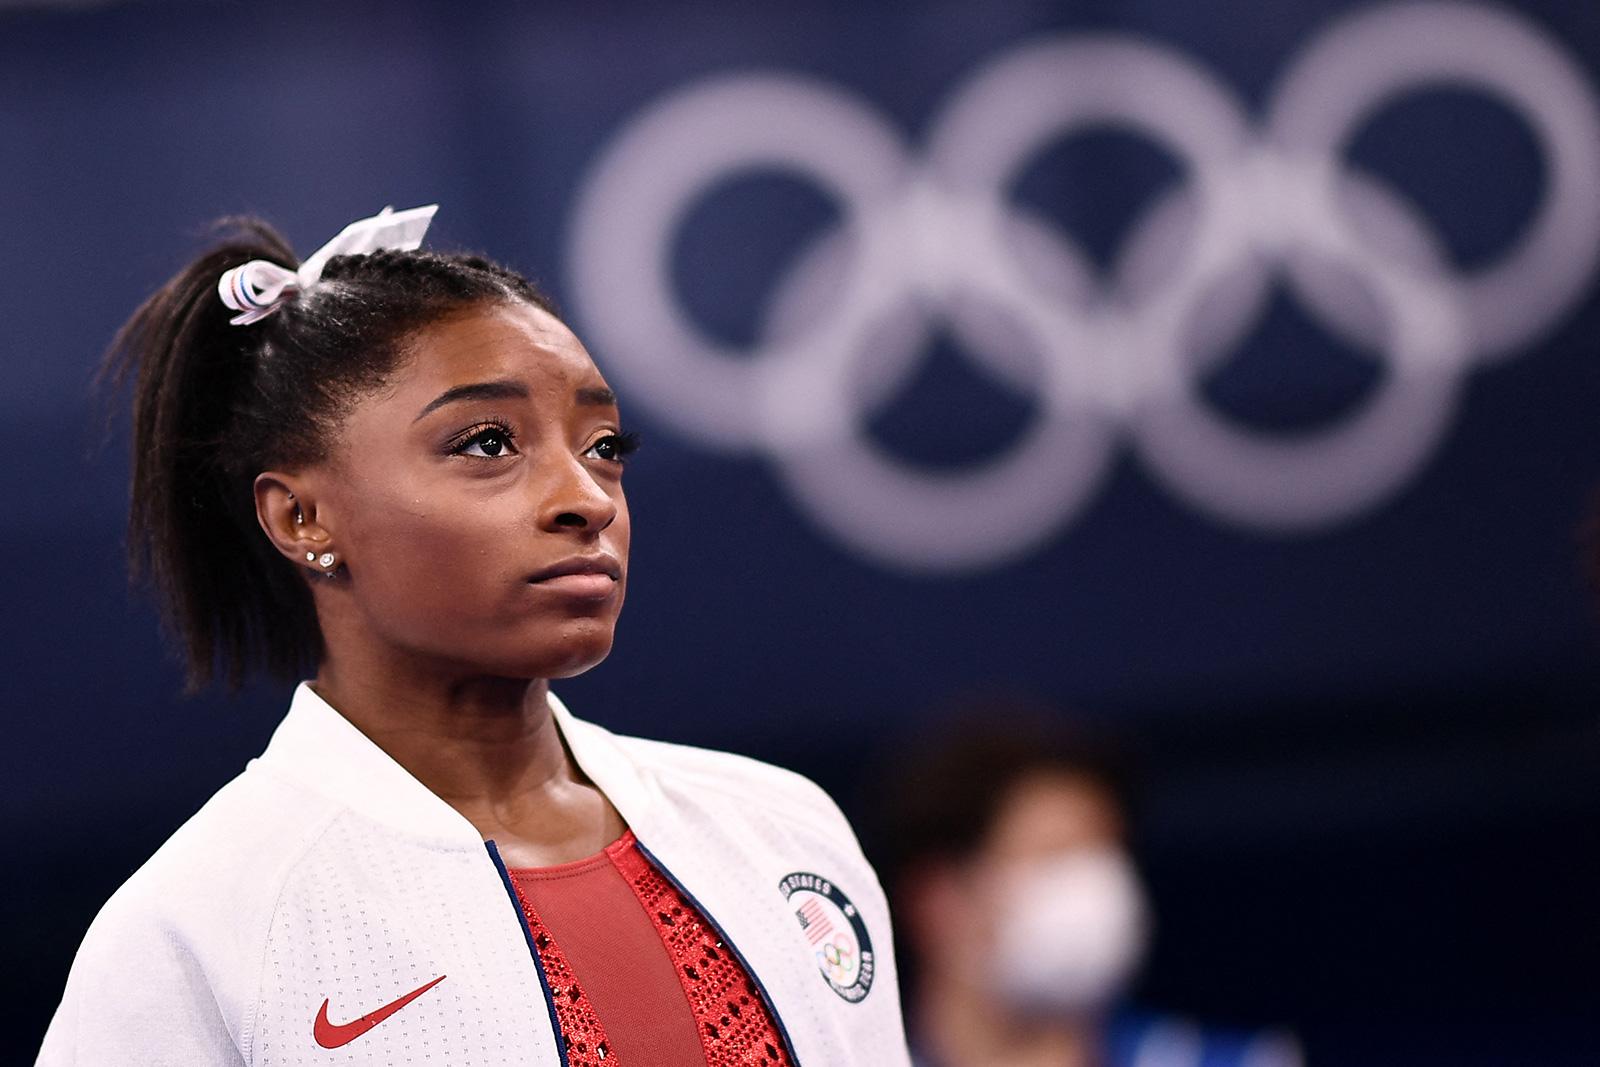 USA's Simone Biles watches the artistic gymnastics women's team final on July 27.